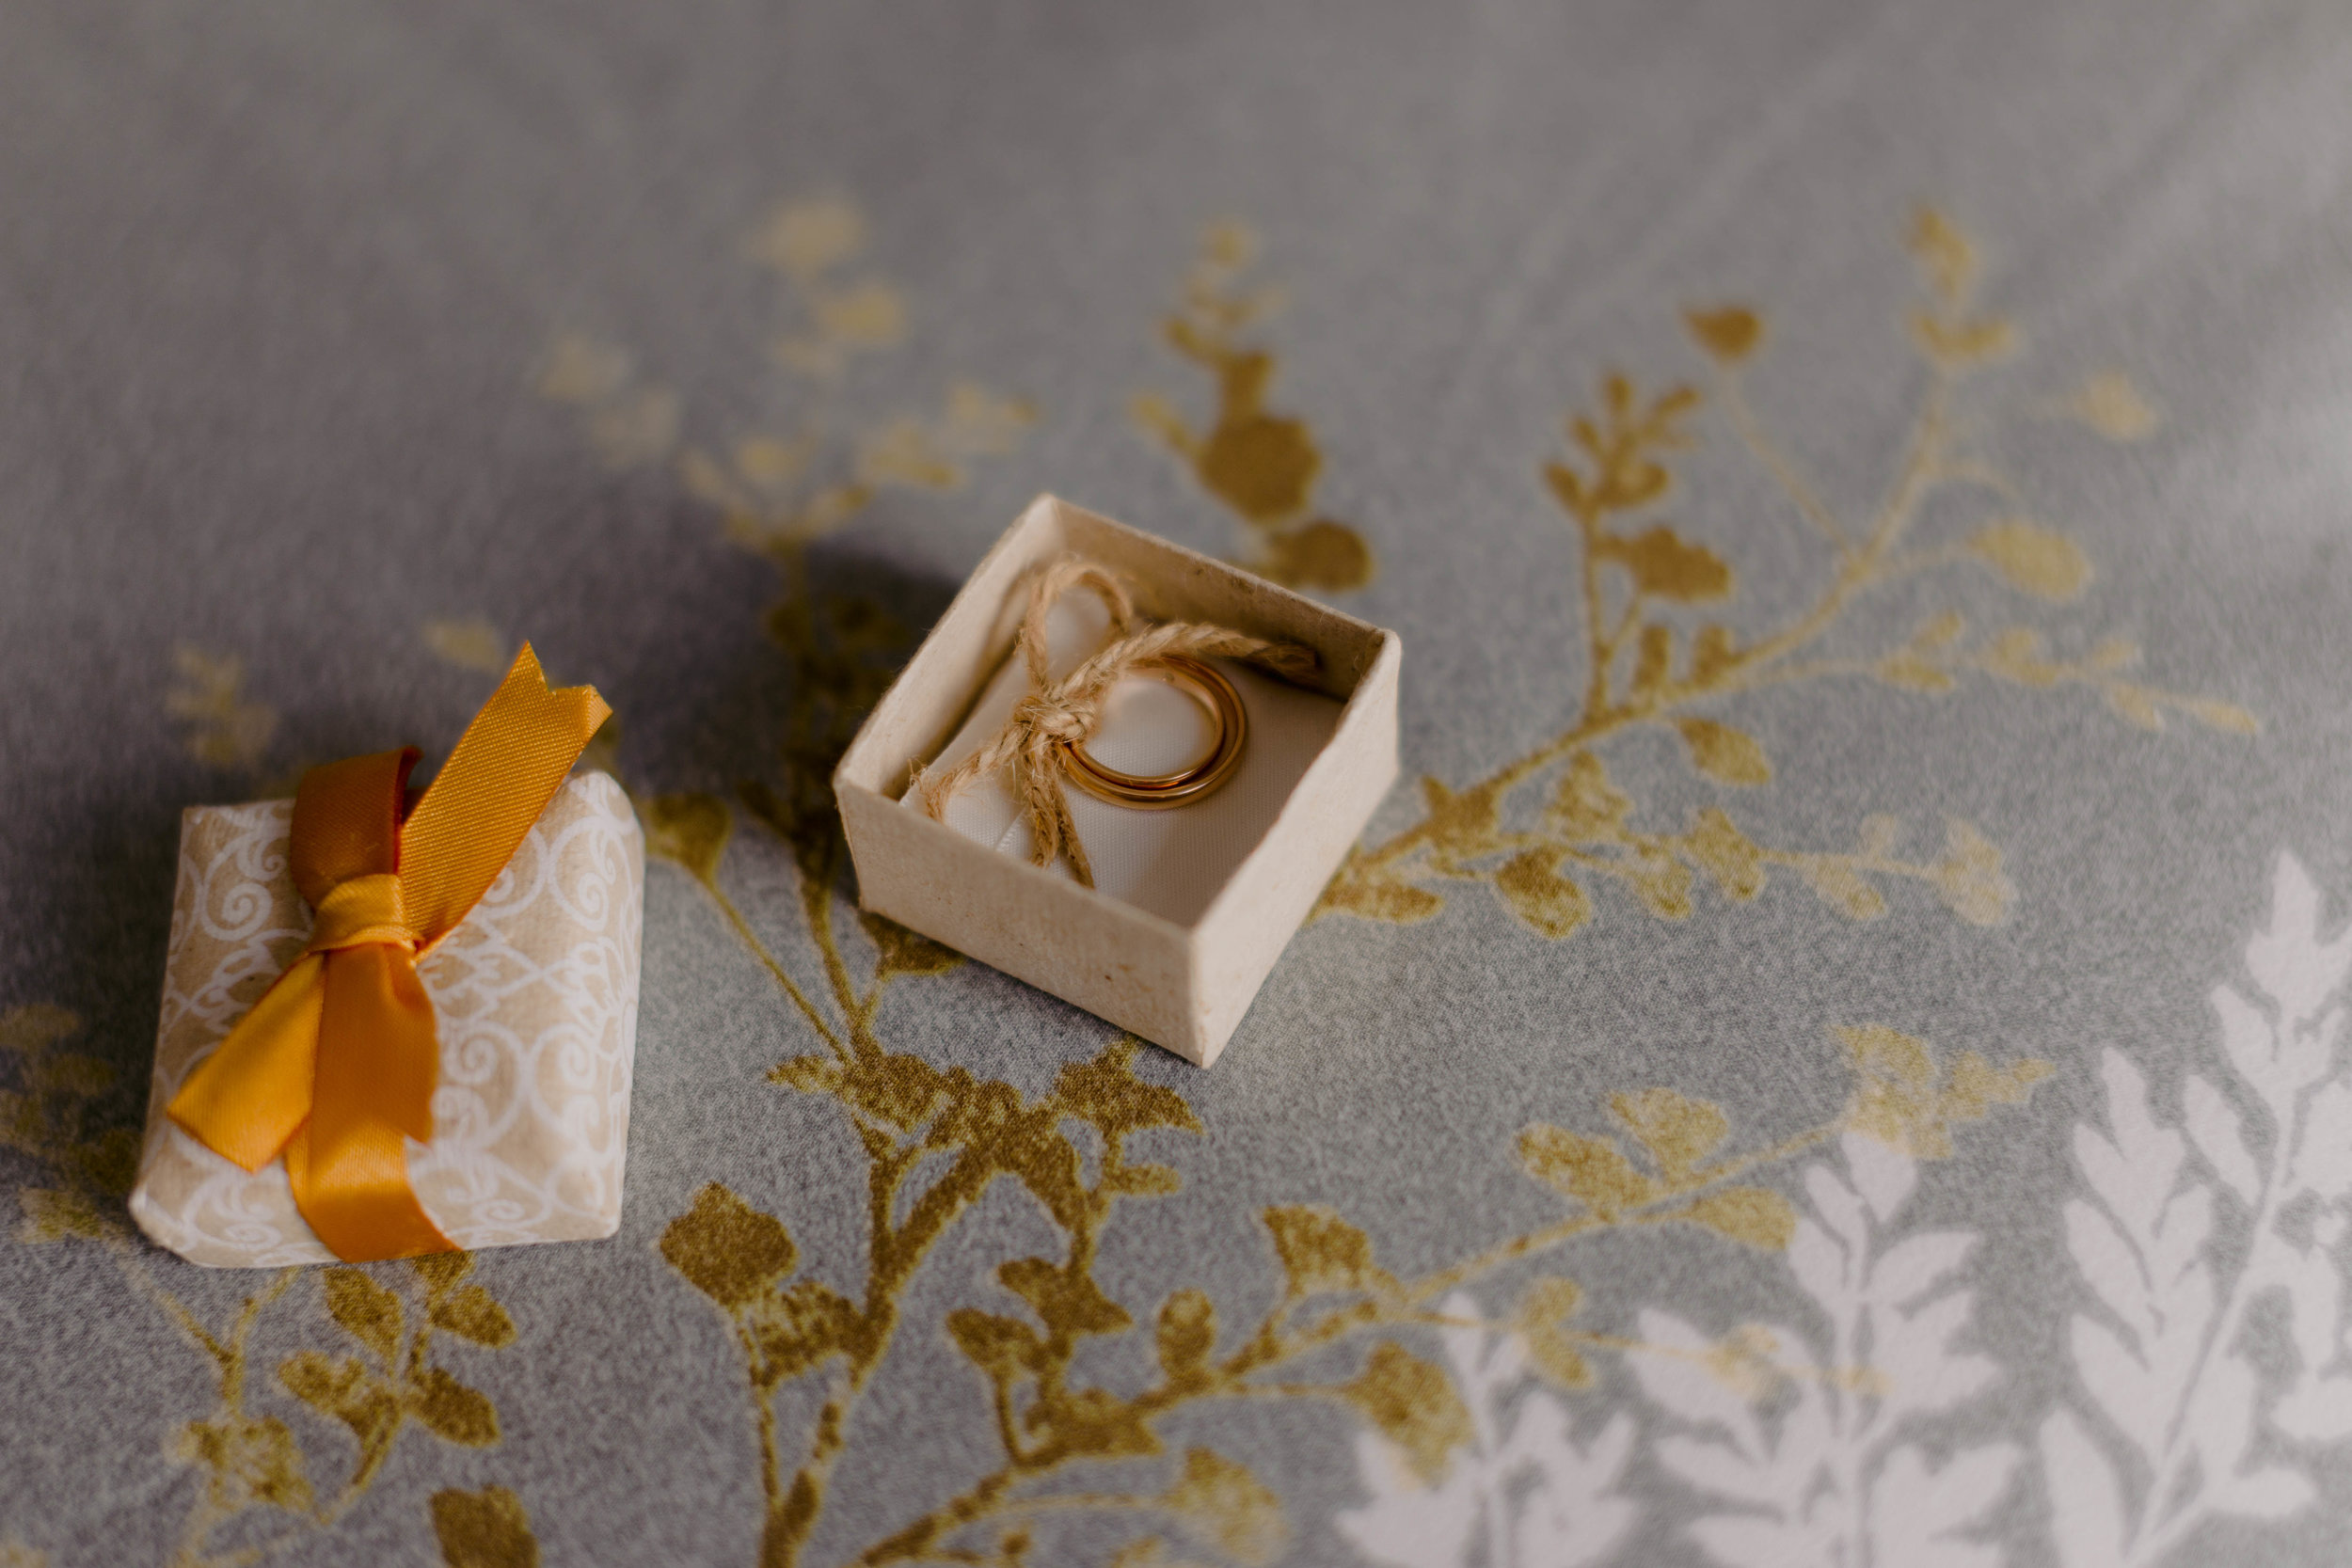 012 - Preparazione sposi.jpg